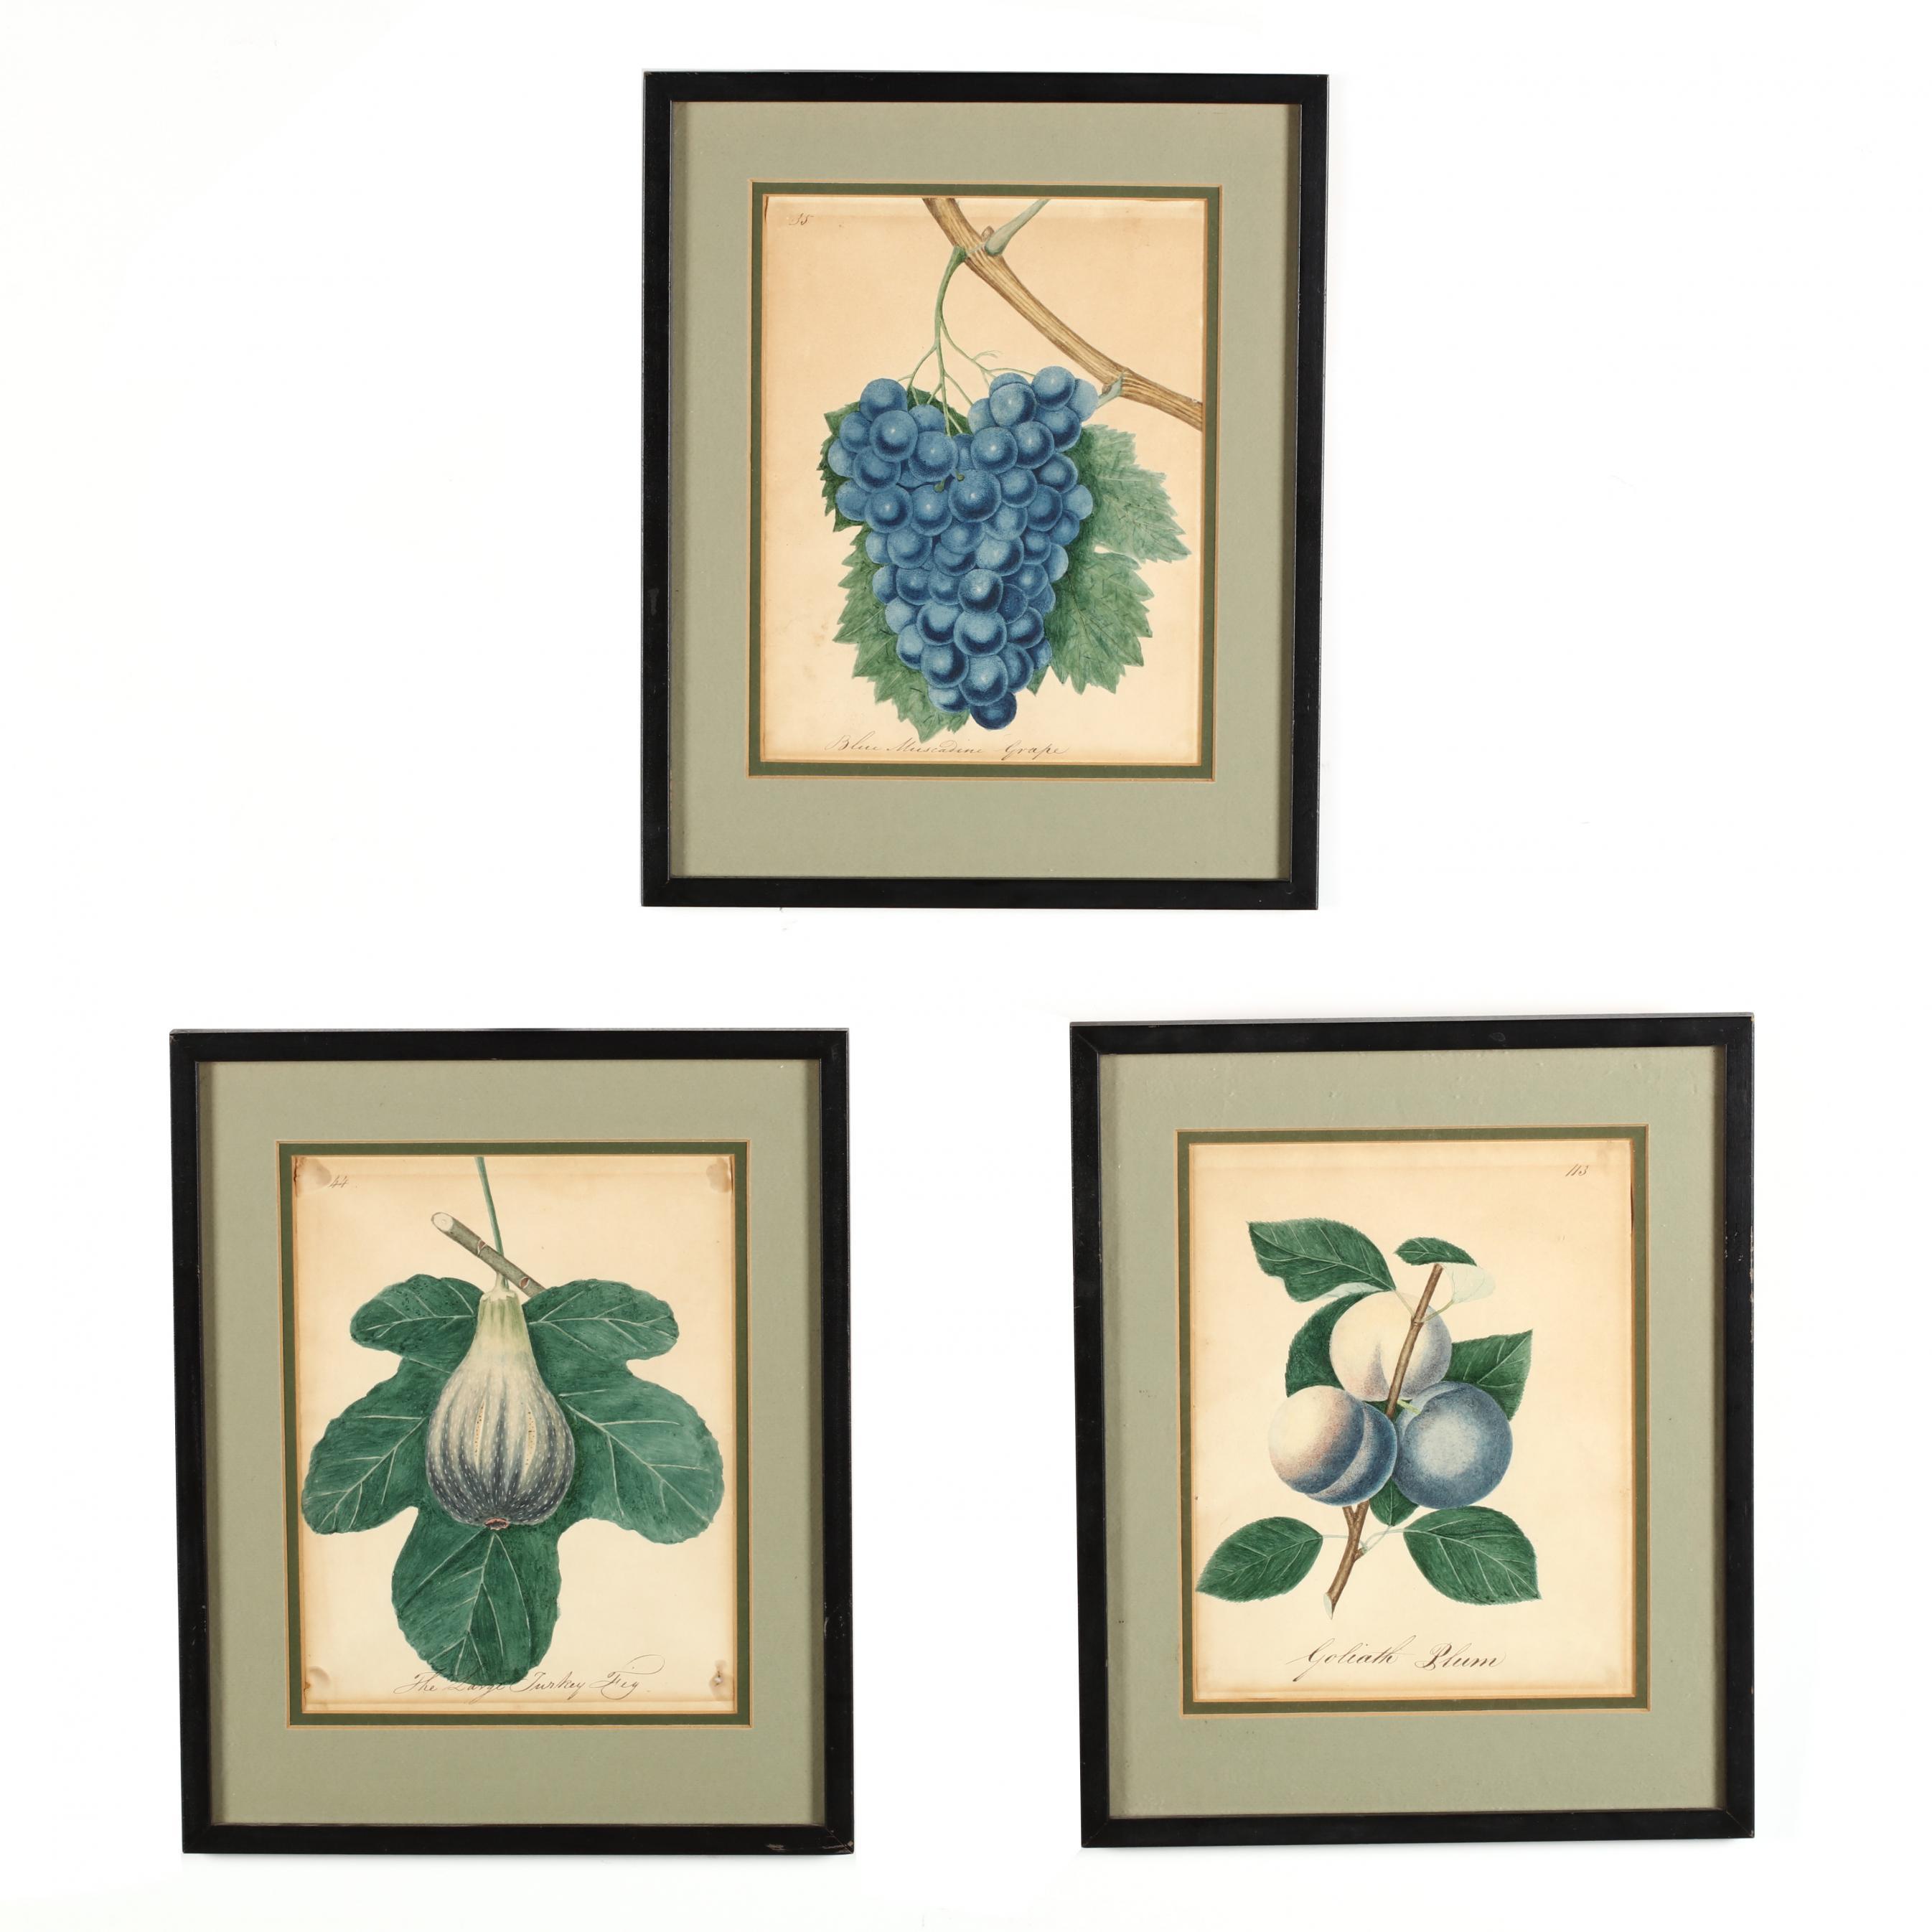 james-veitch-scottish-1792-1863-three-illustrations-of-fruits